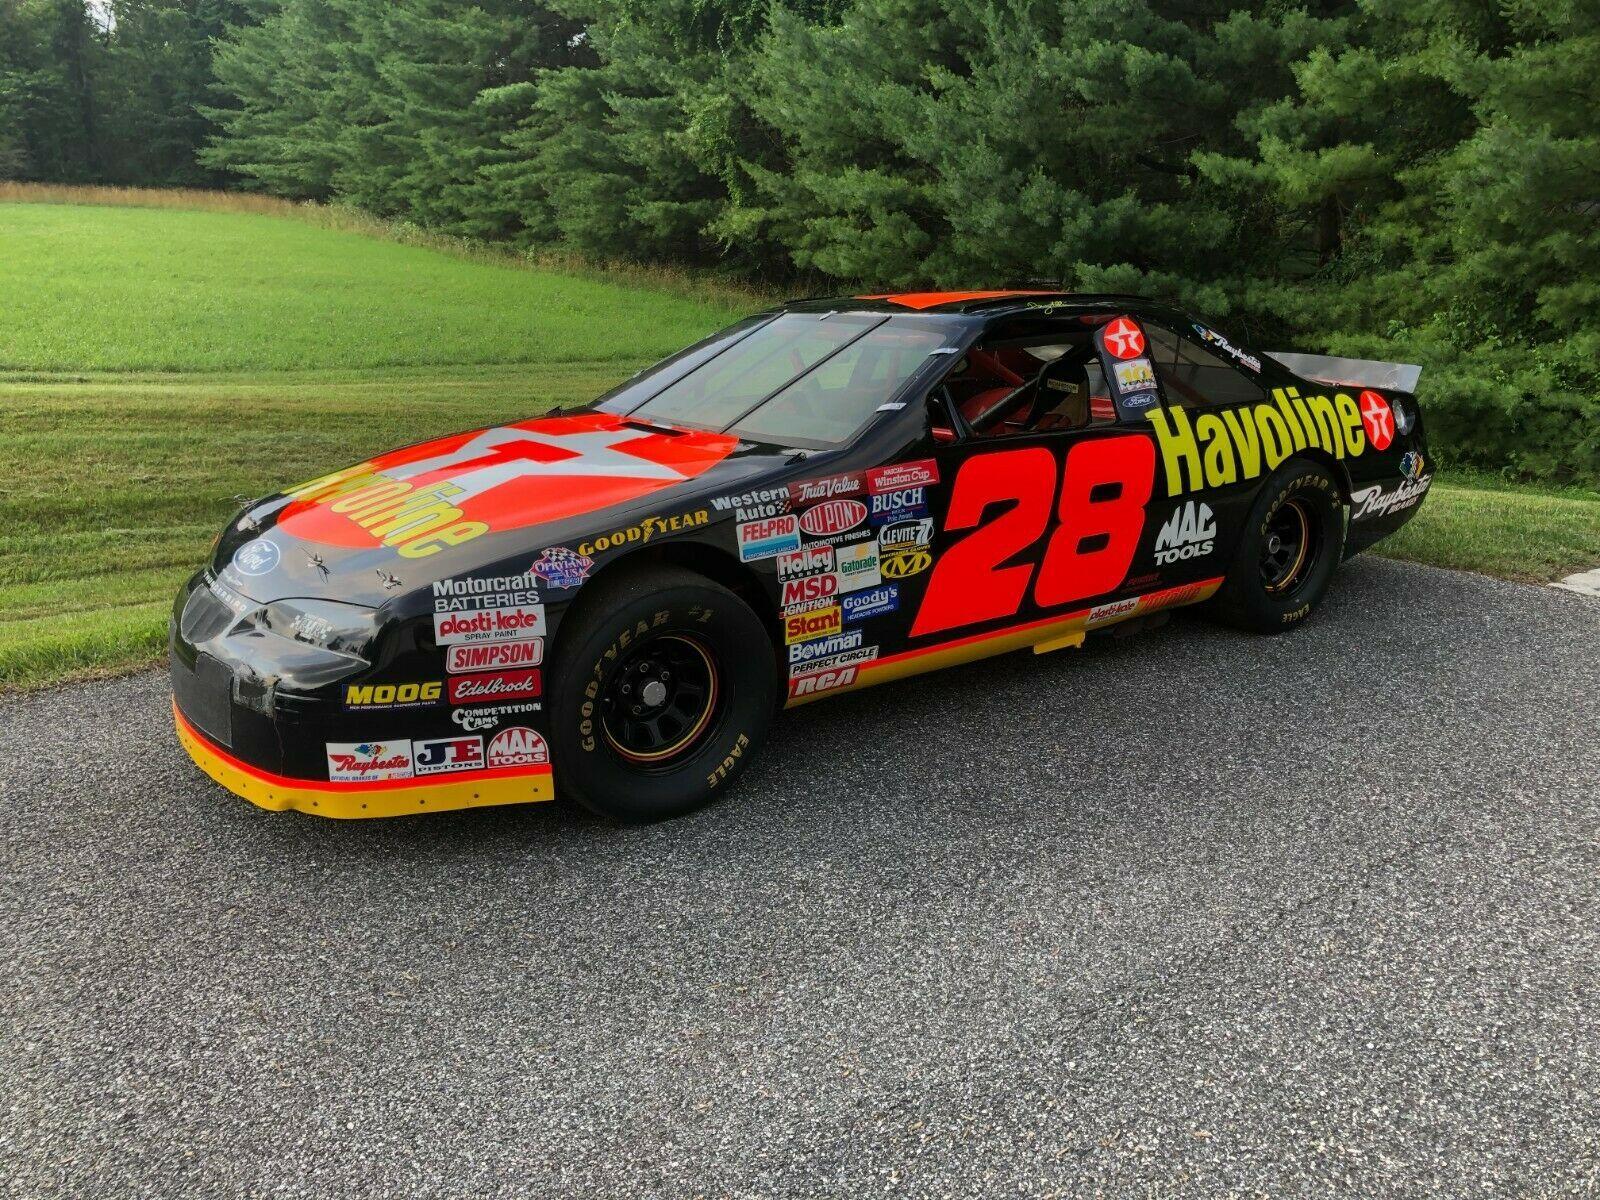 The Nascar Cup Car Davey Allison Crashed At Pocono Is For Sale